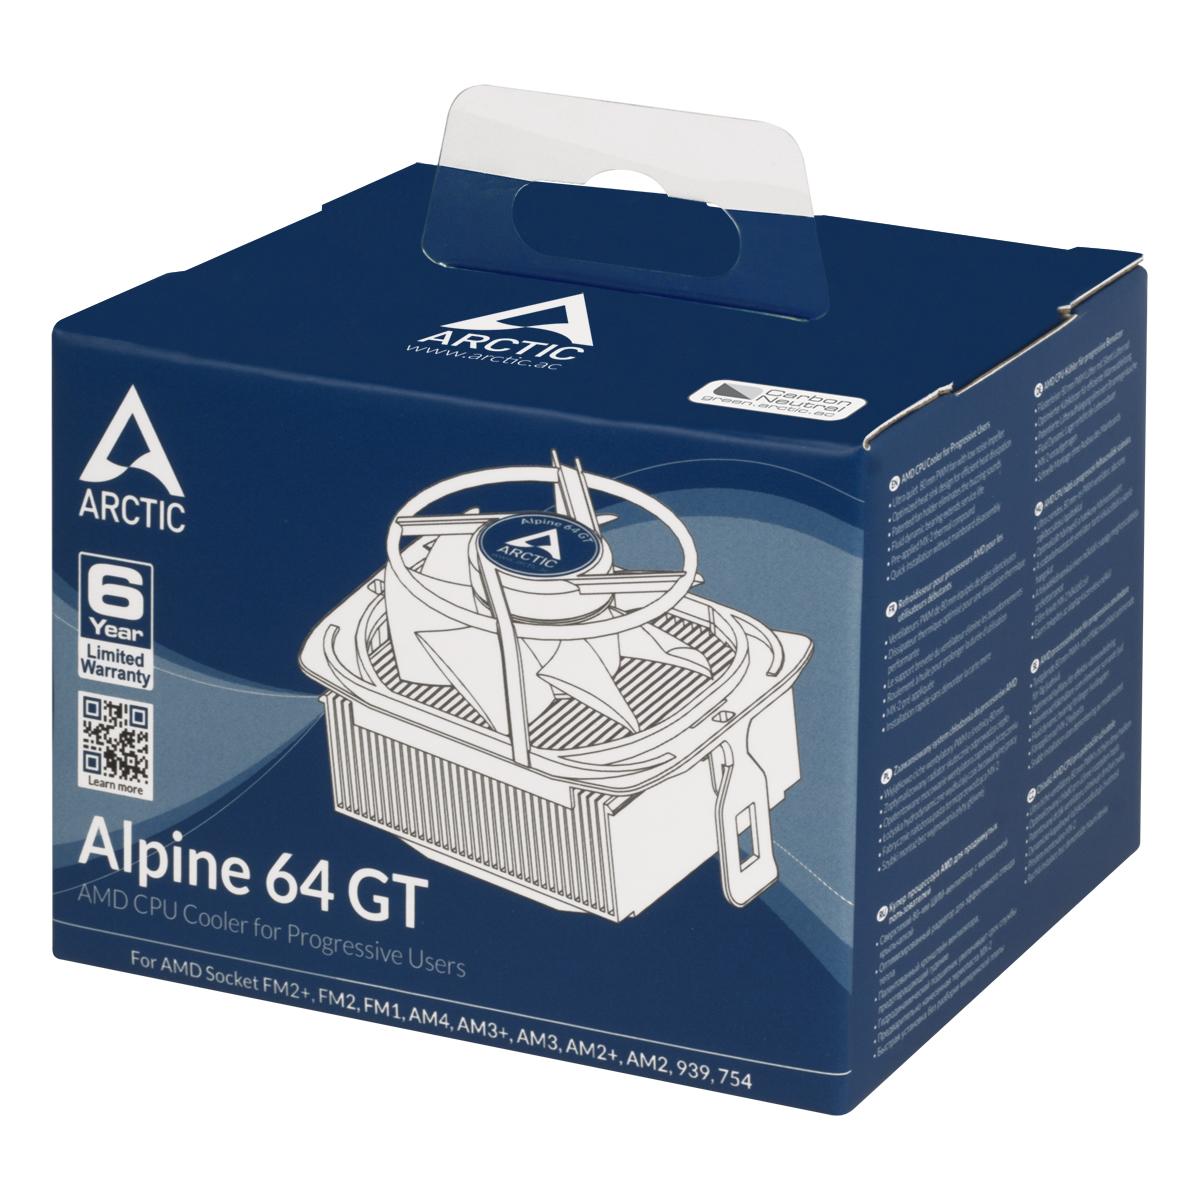 Alpine 64 GT